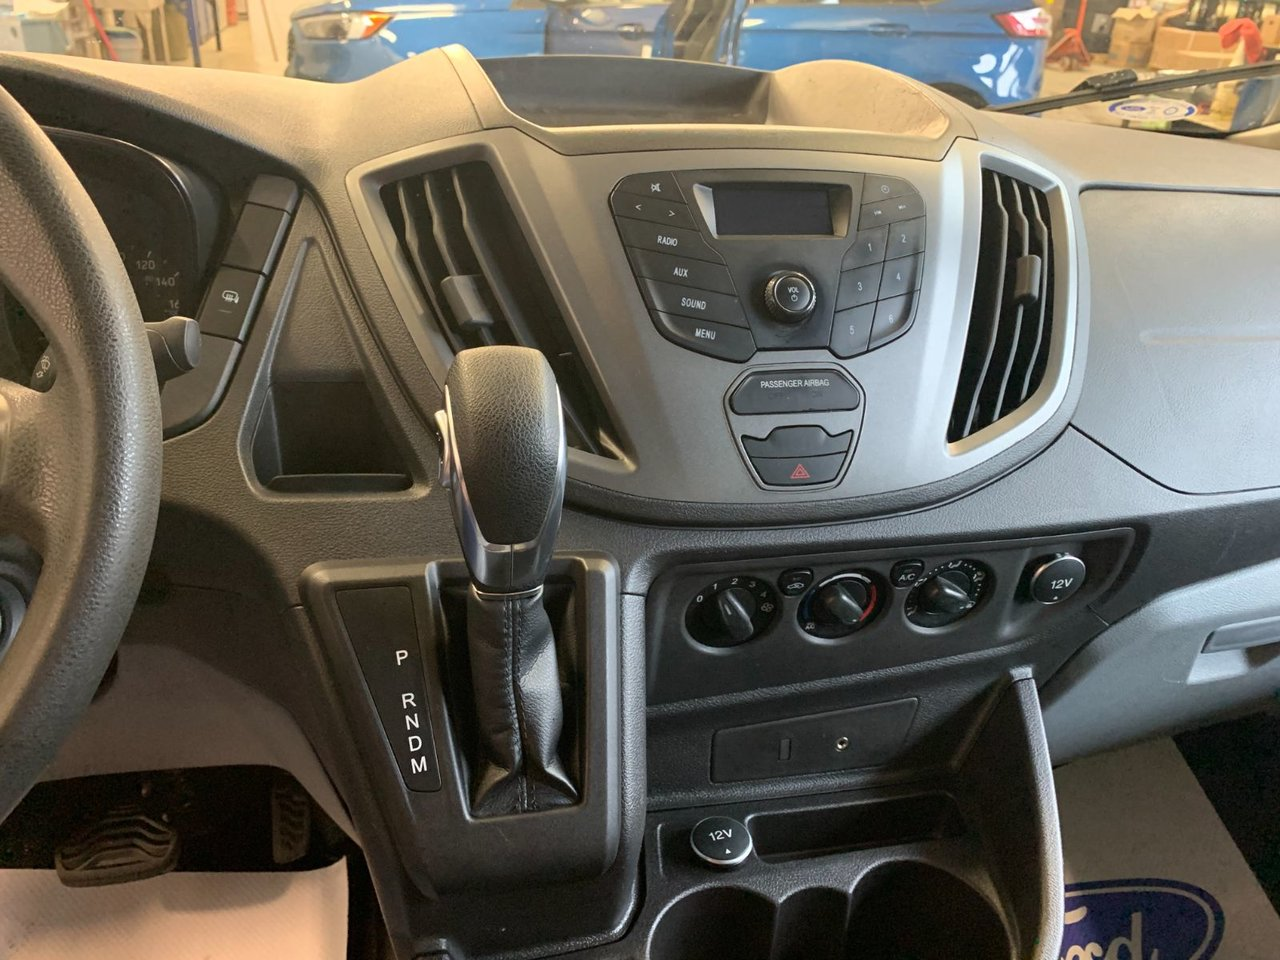 2016 Ford Transit Chassis Cab 350 HD RÉFRIGÉRER